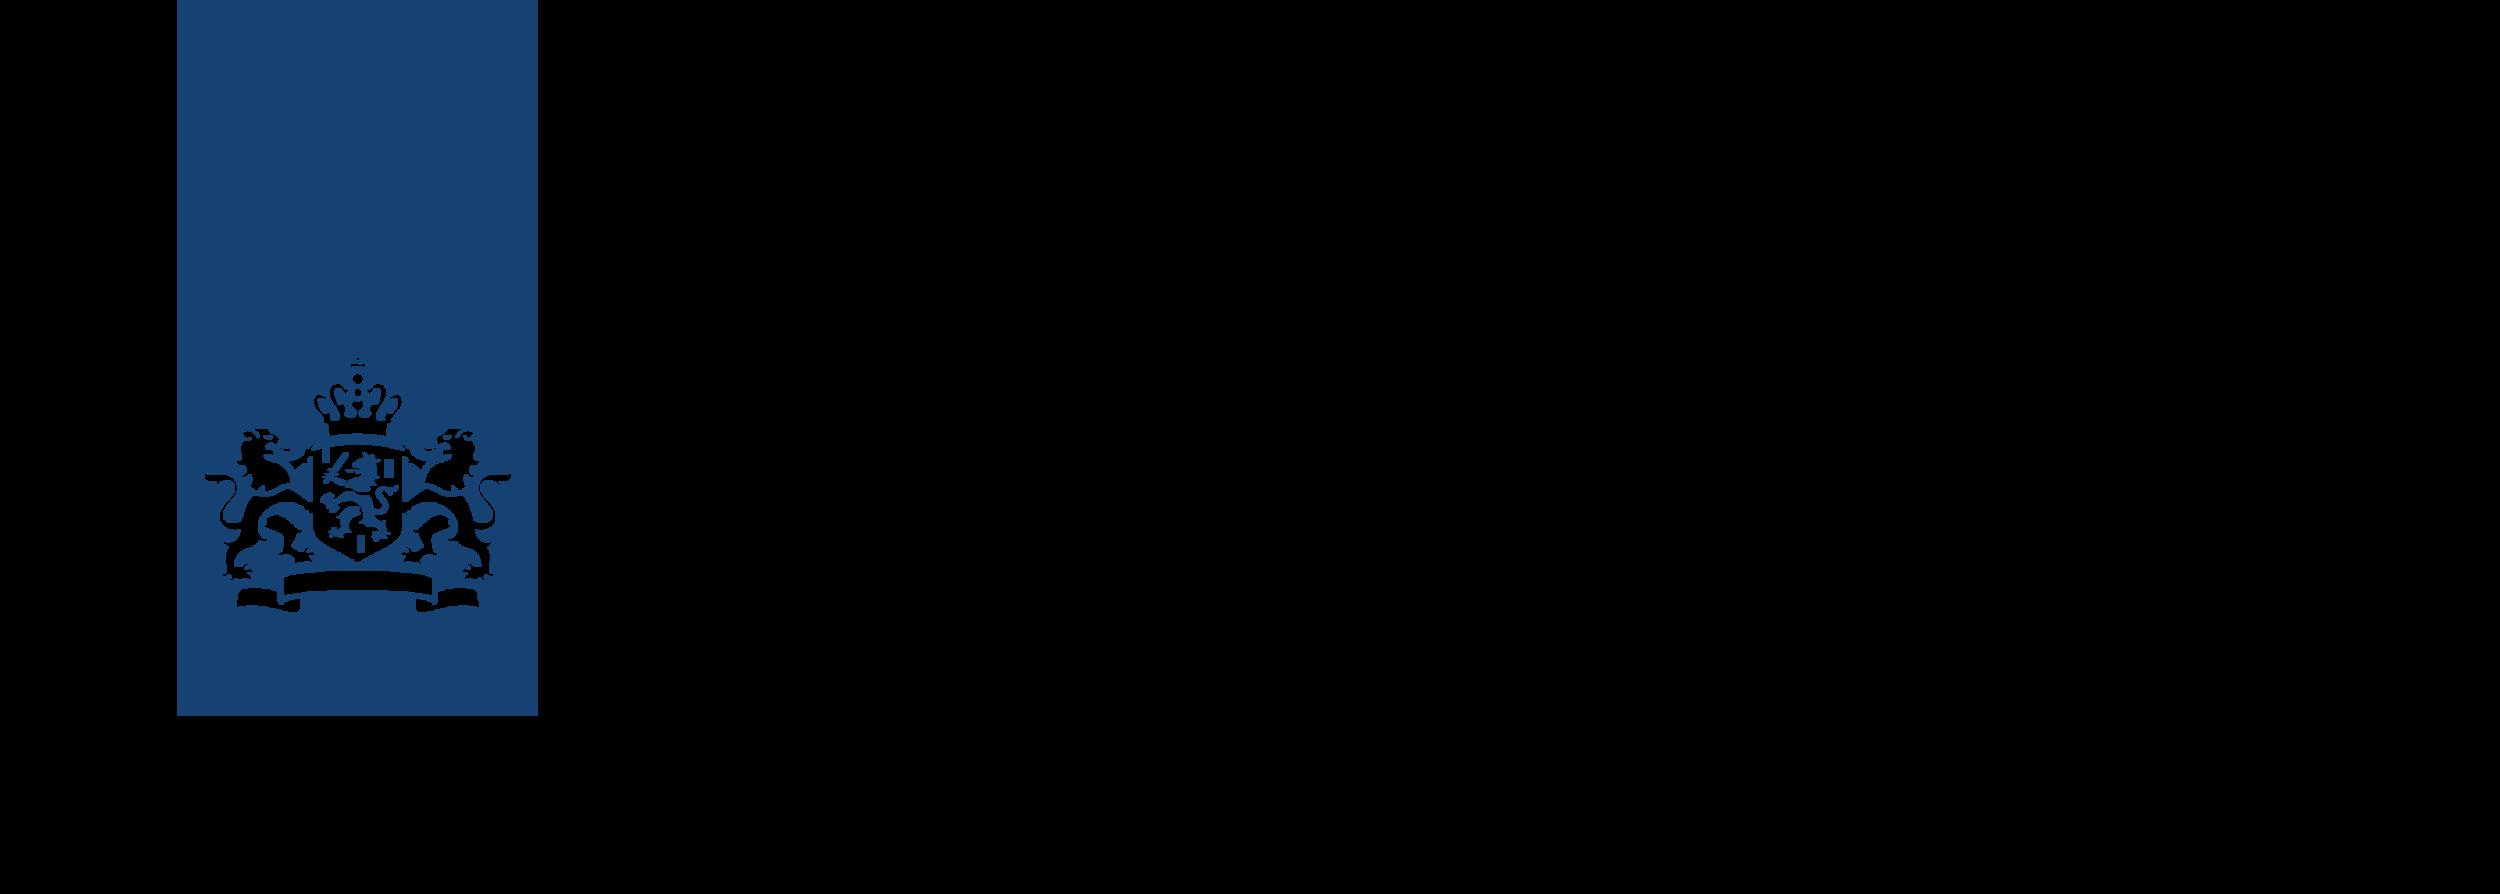 Min.-Infrastructuur-en-milieu-Logo_2_RGB_pos-op-kleur copy.png